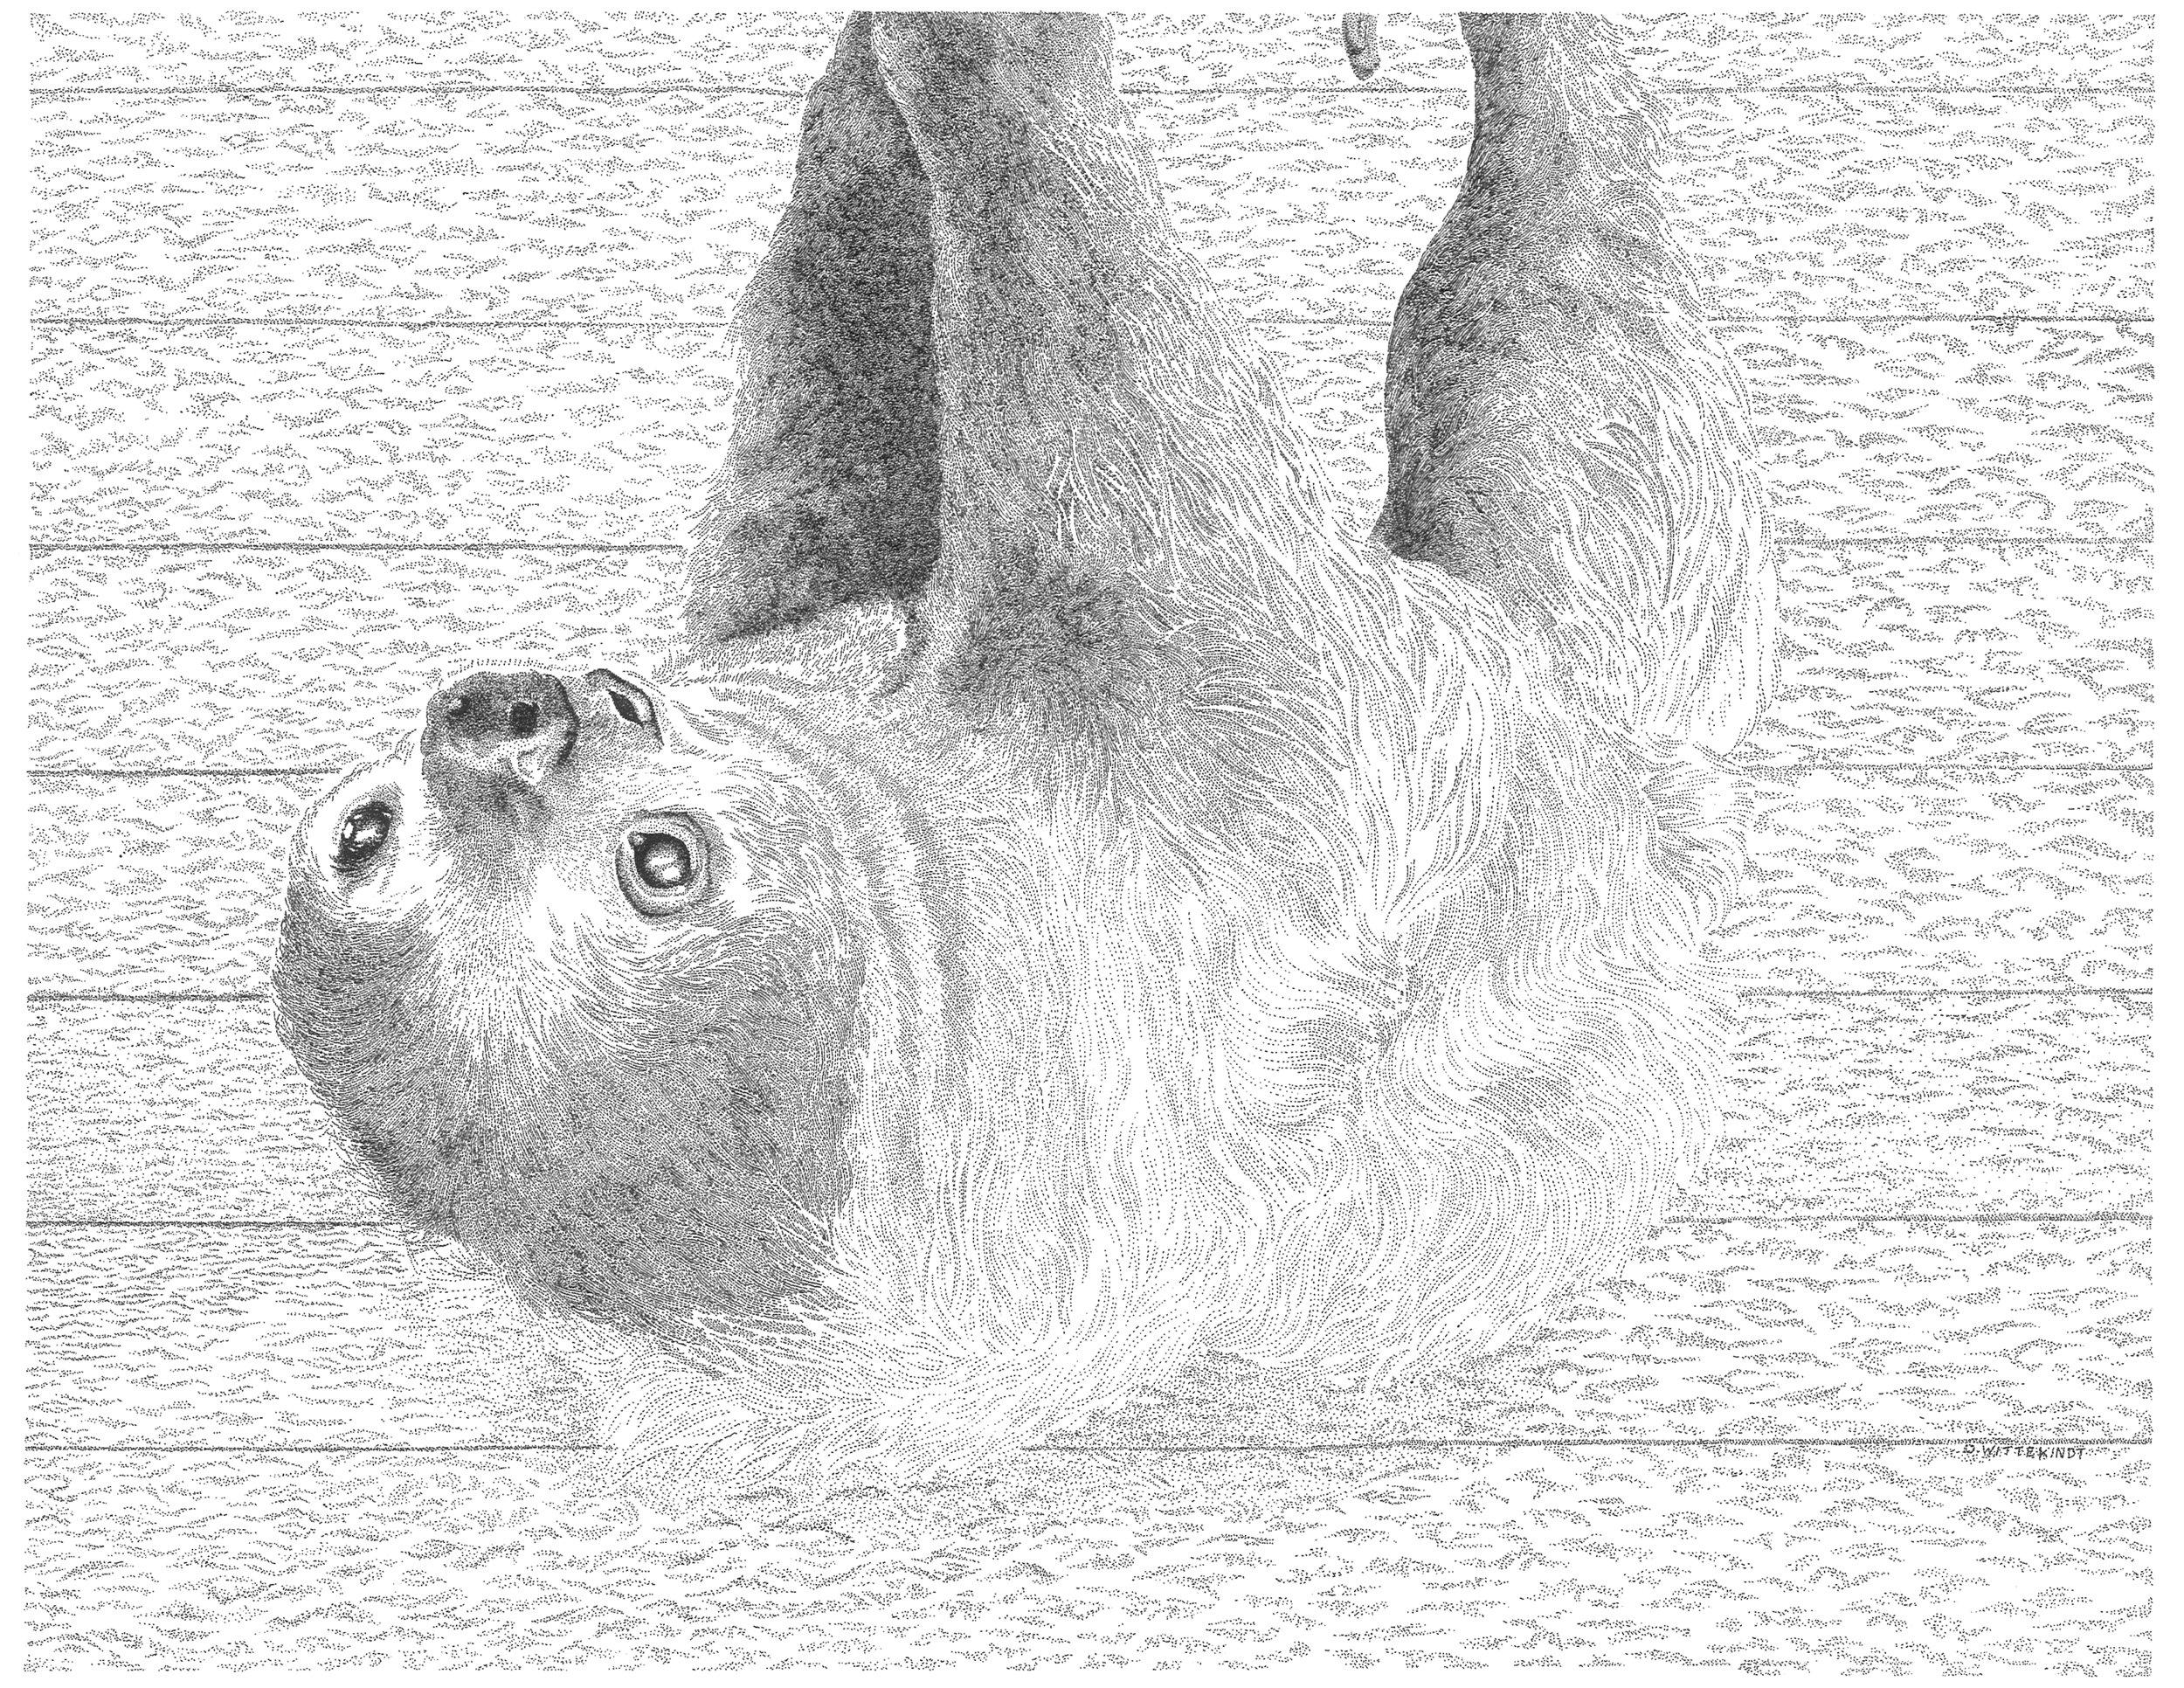 Poco the sloth